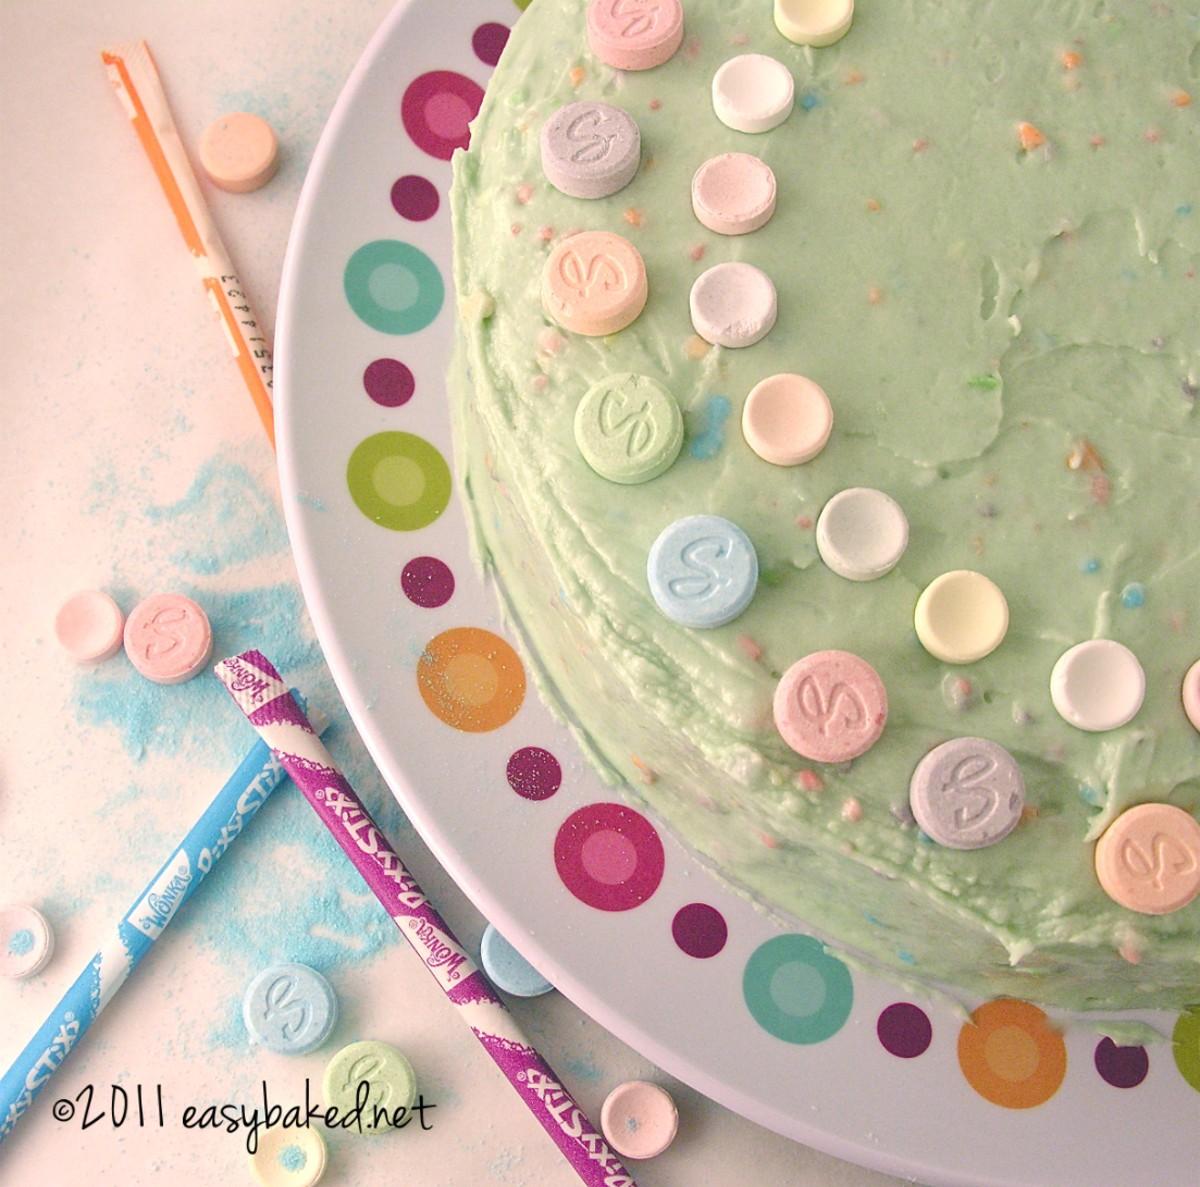 sweet tart and pixie stick cake